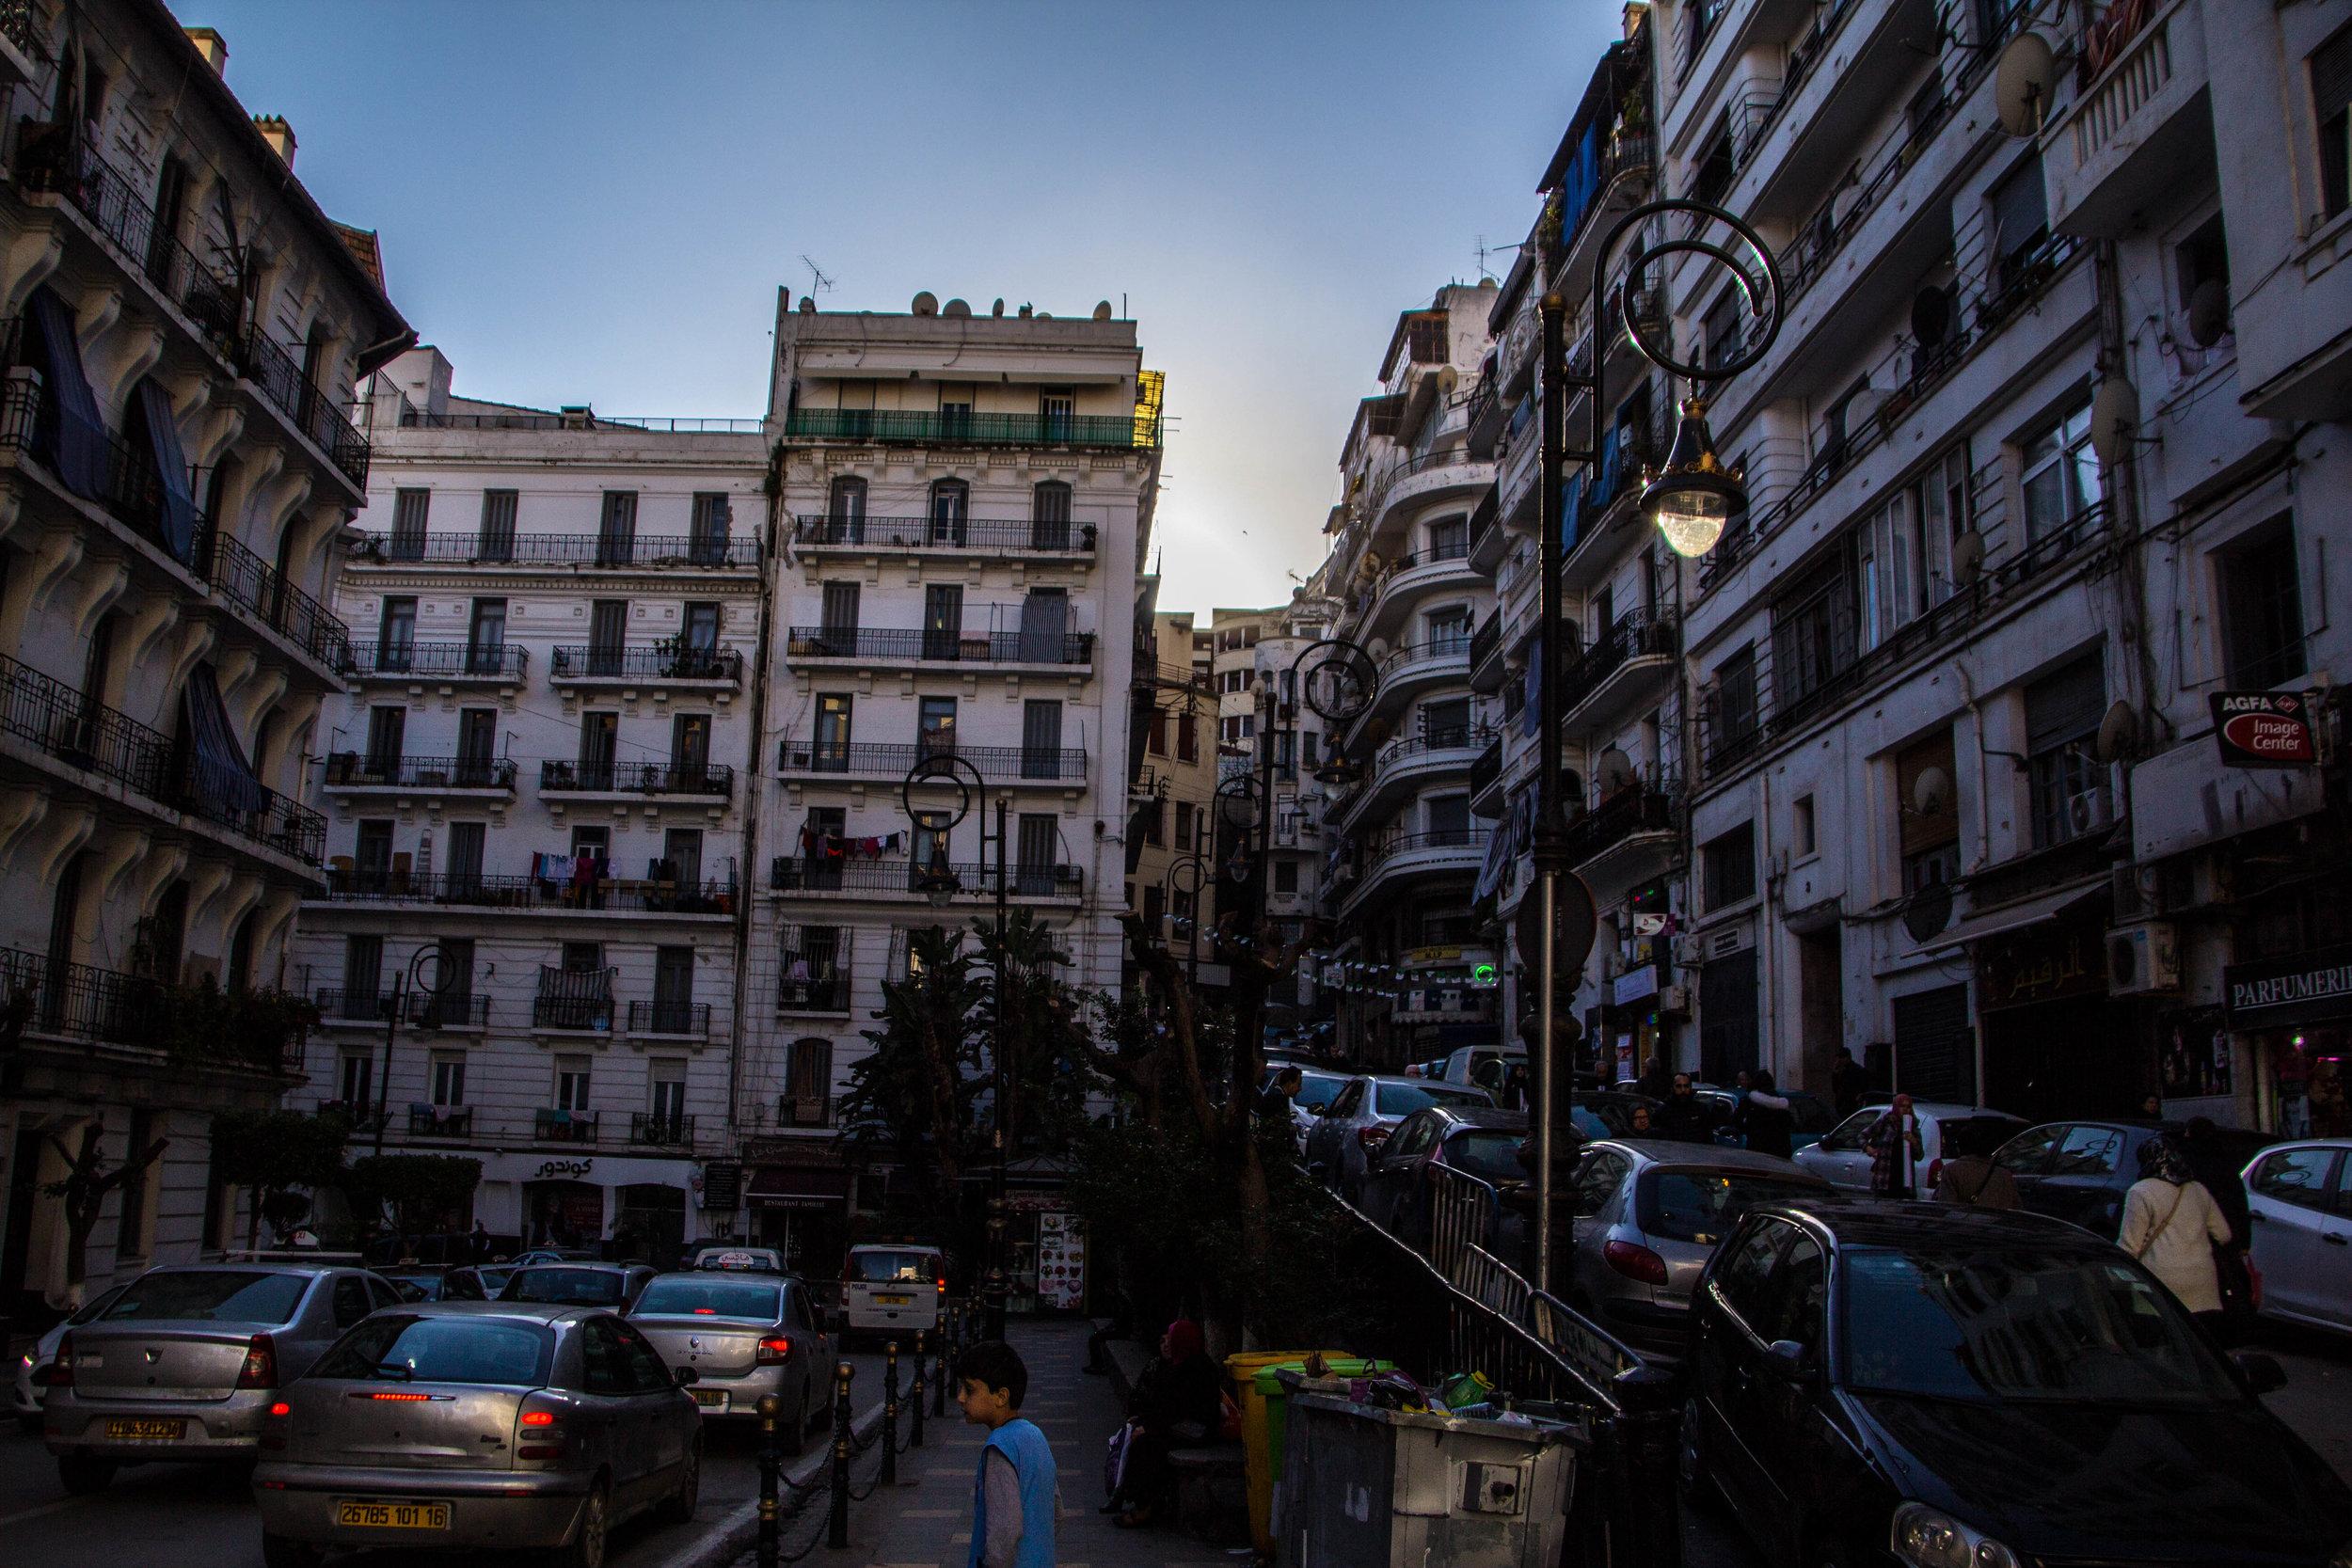 streets-algiers-algeria-11-2.jpg